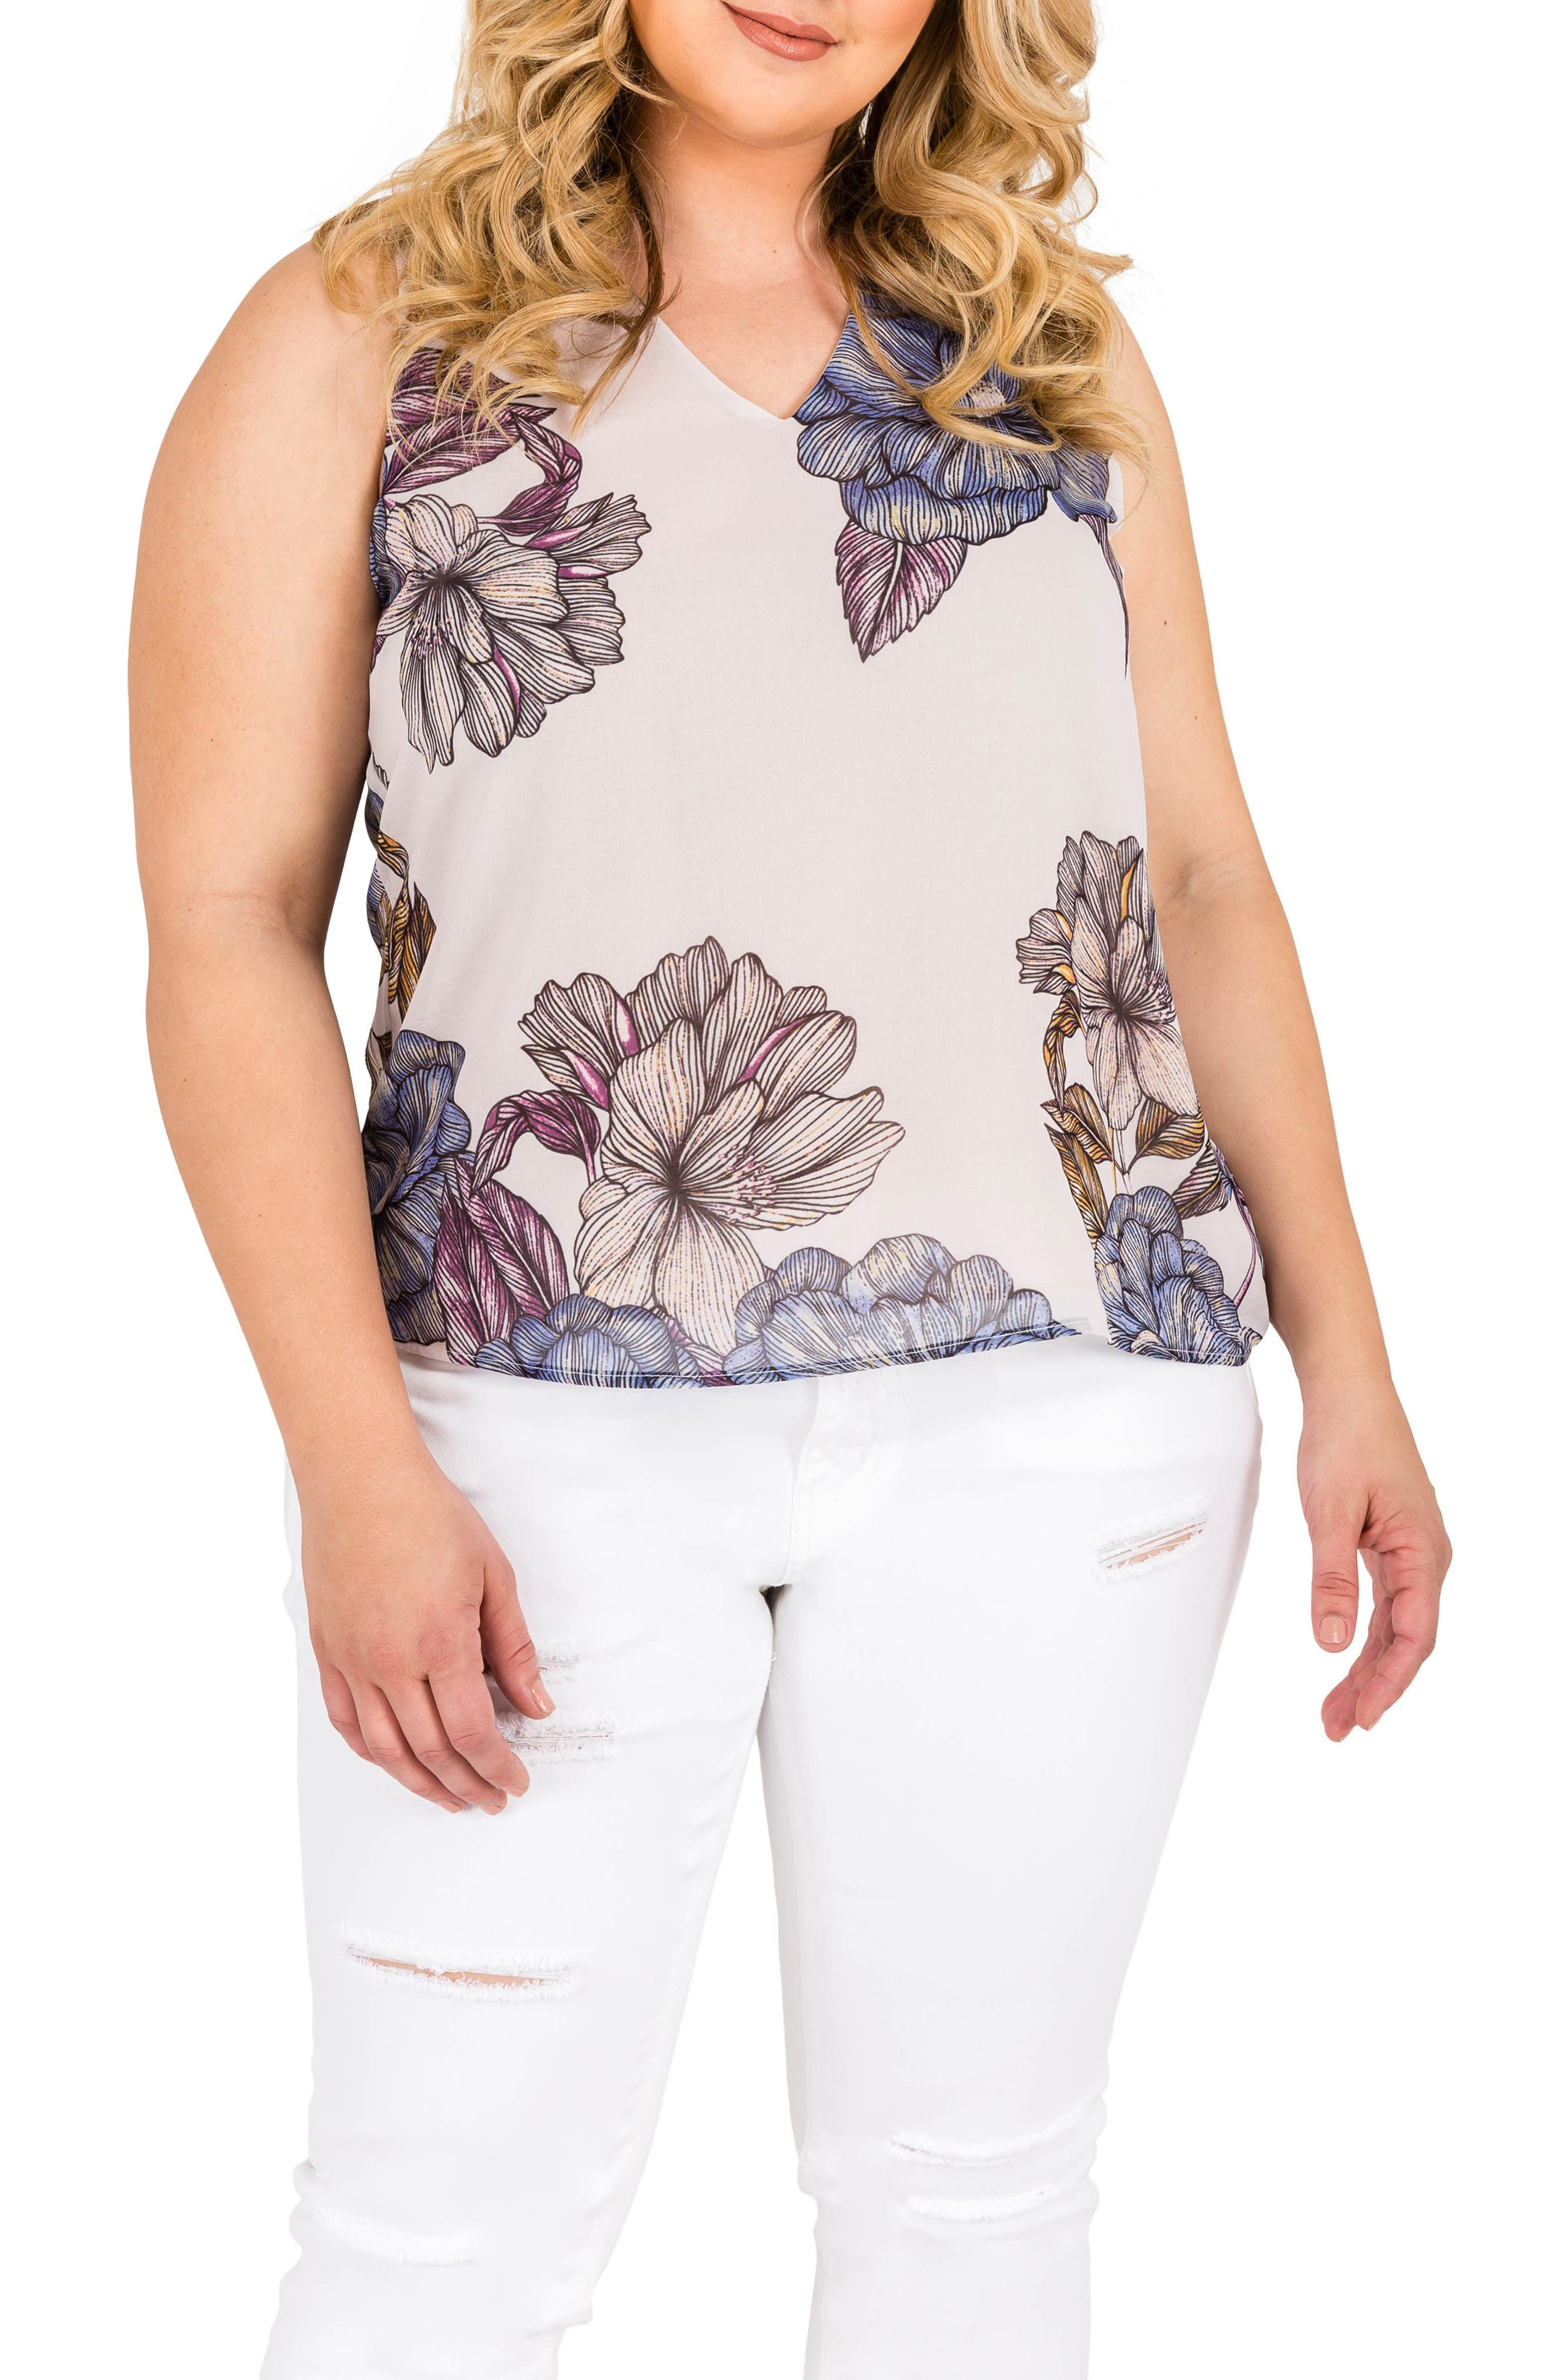 Sasha Floral Top,                         Main,                         color, Light Gray Floral Print